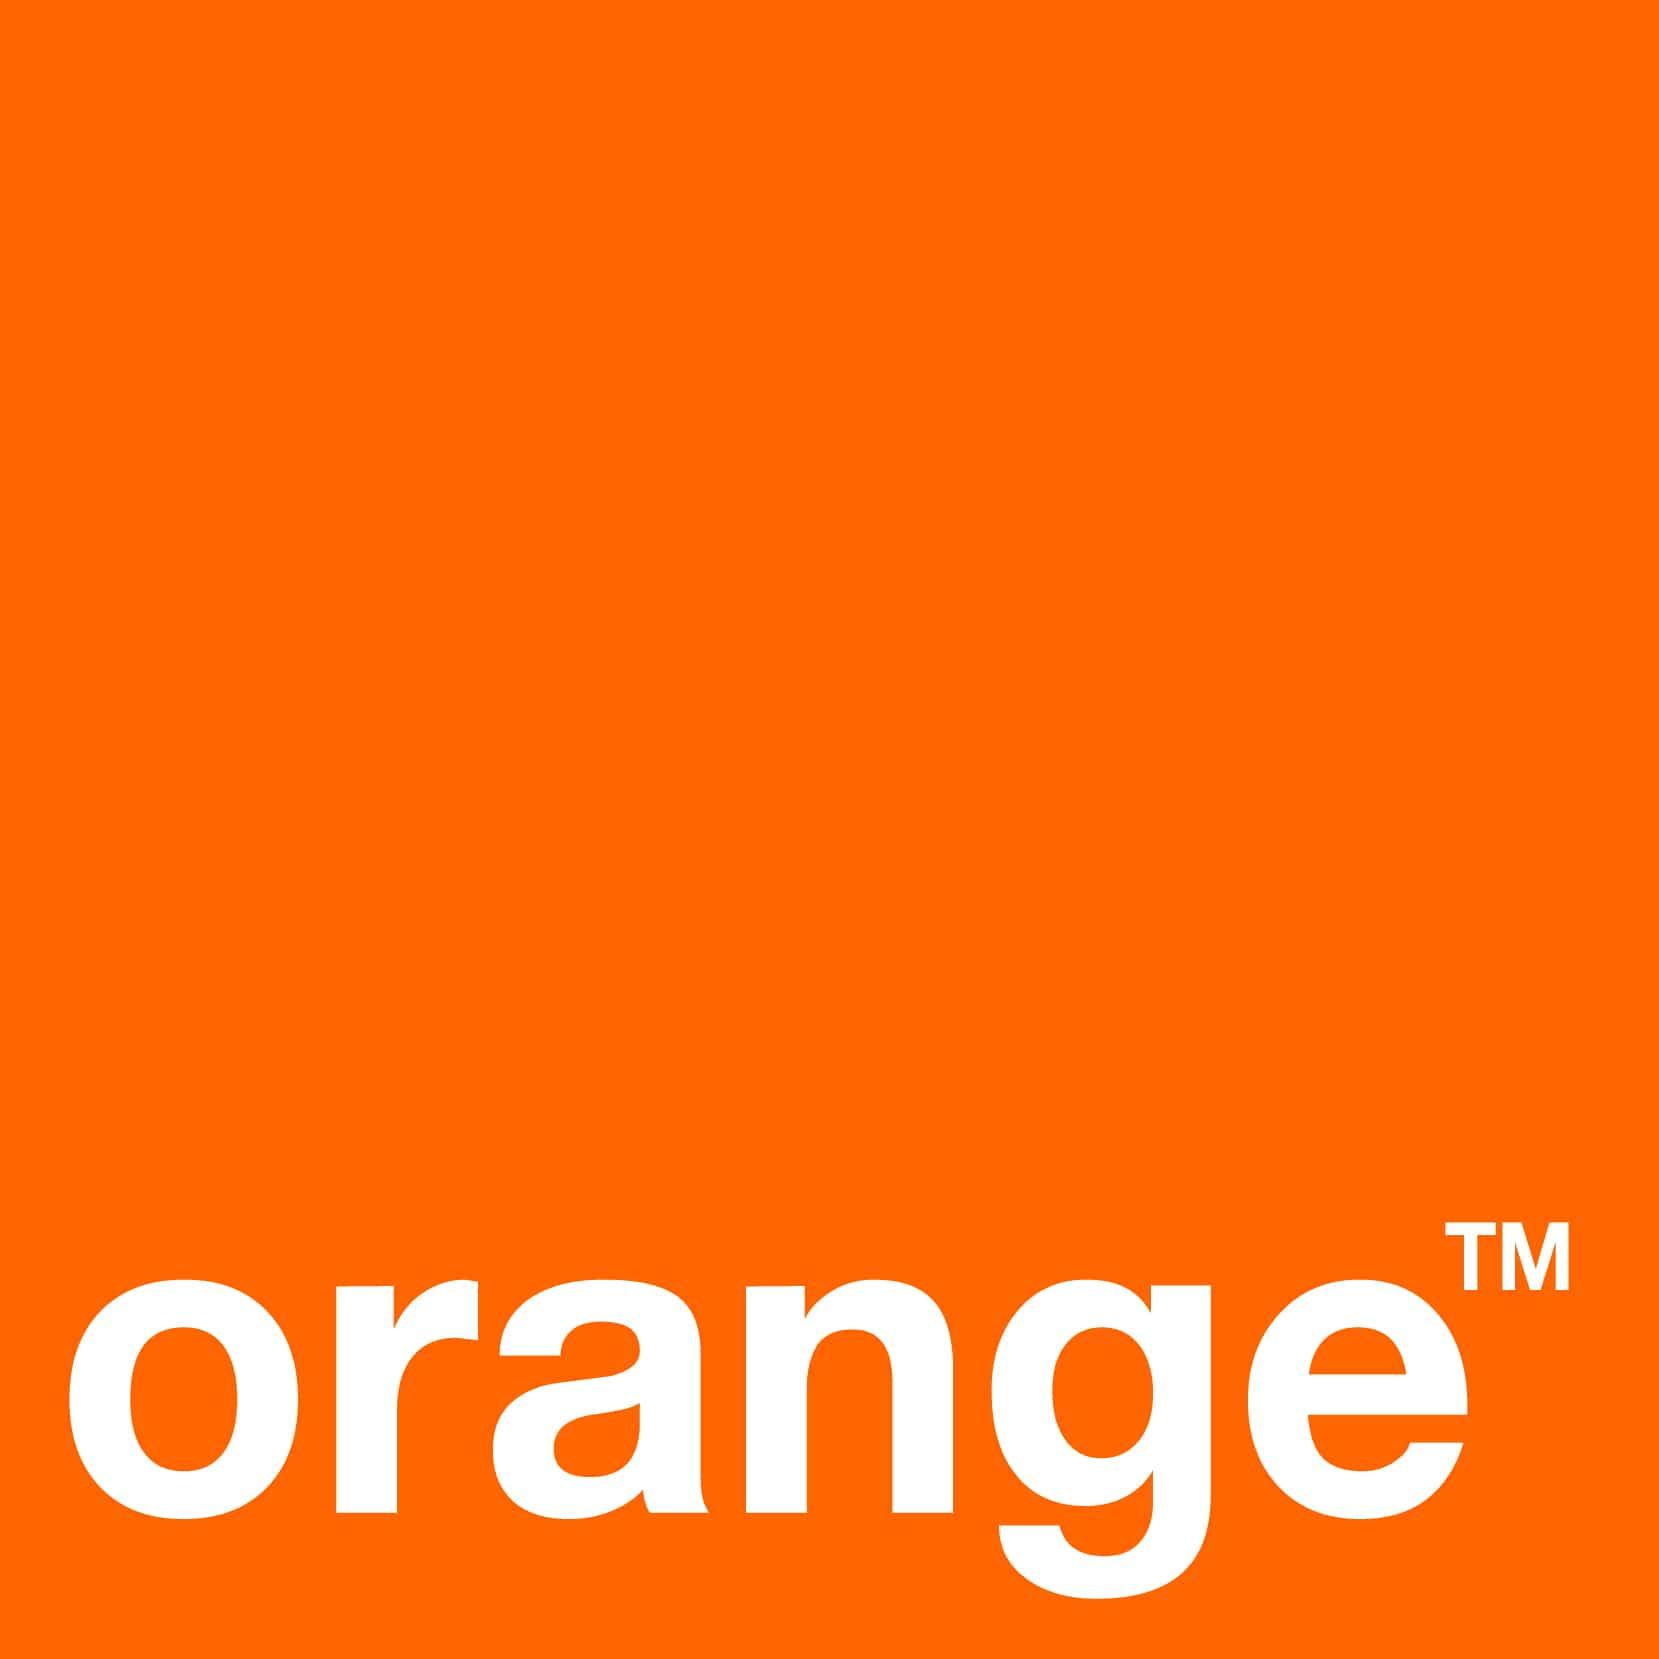 http://pilotesdeprocessus.org/wp-content/uploads/2017/12/logo-orange-hd.jpg